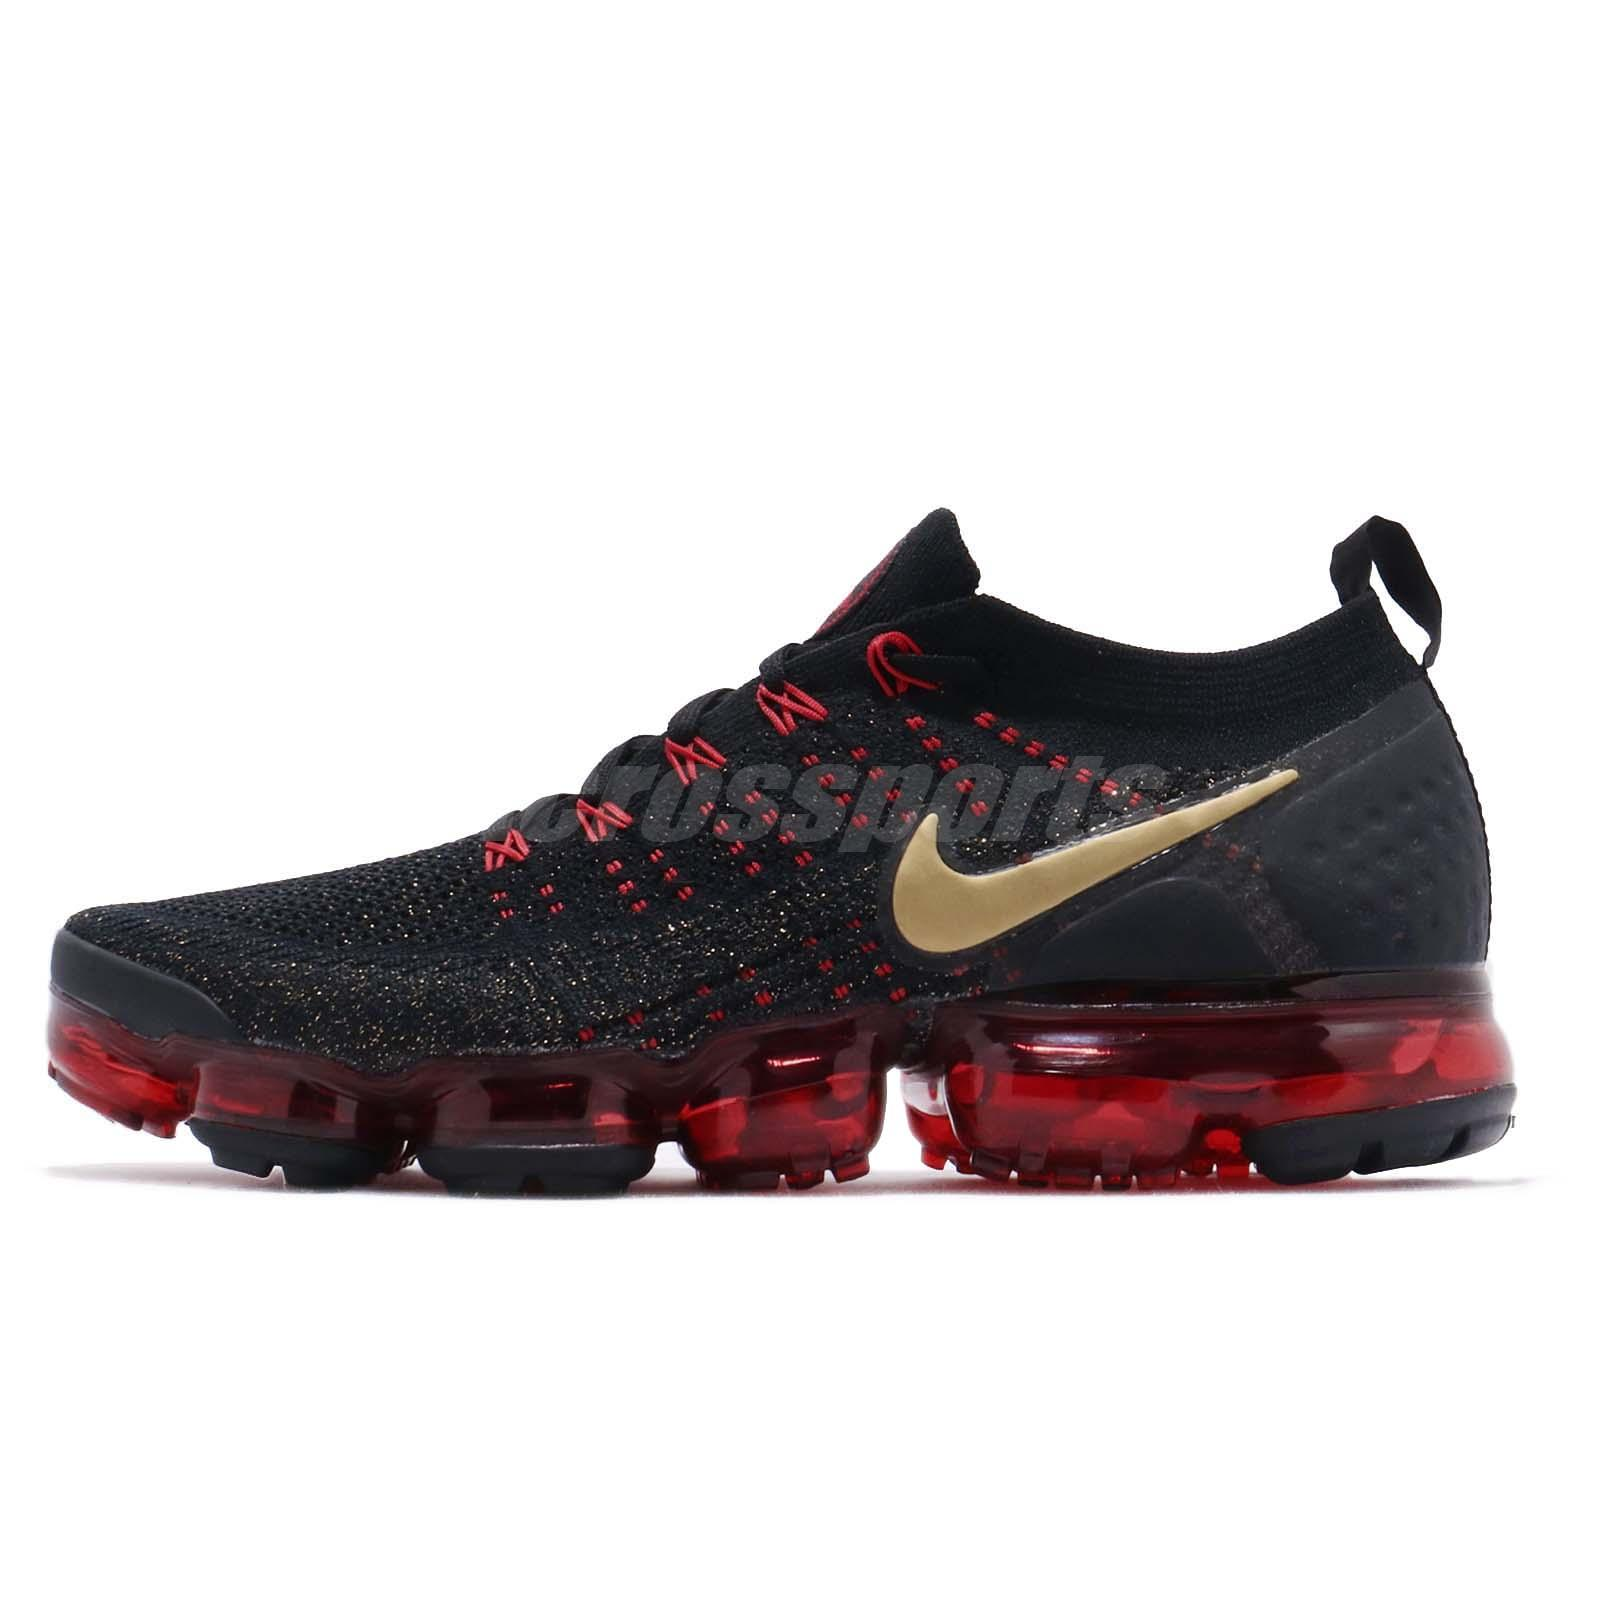 4518aaeea307a Nike Air Vapormax FK 2 CNY Flyknit Chinese New Year Men Shoes Sneaker  BQ7036-001